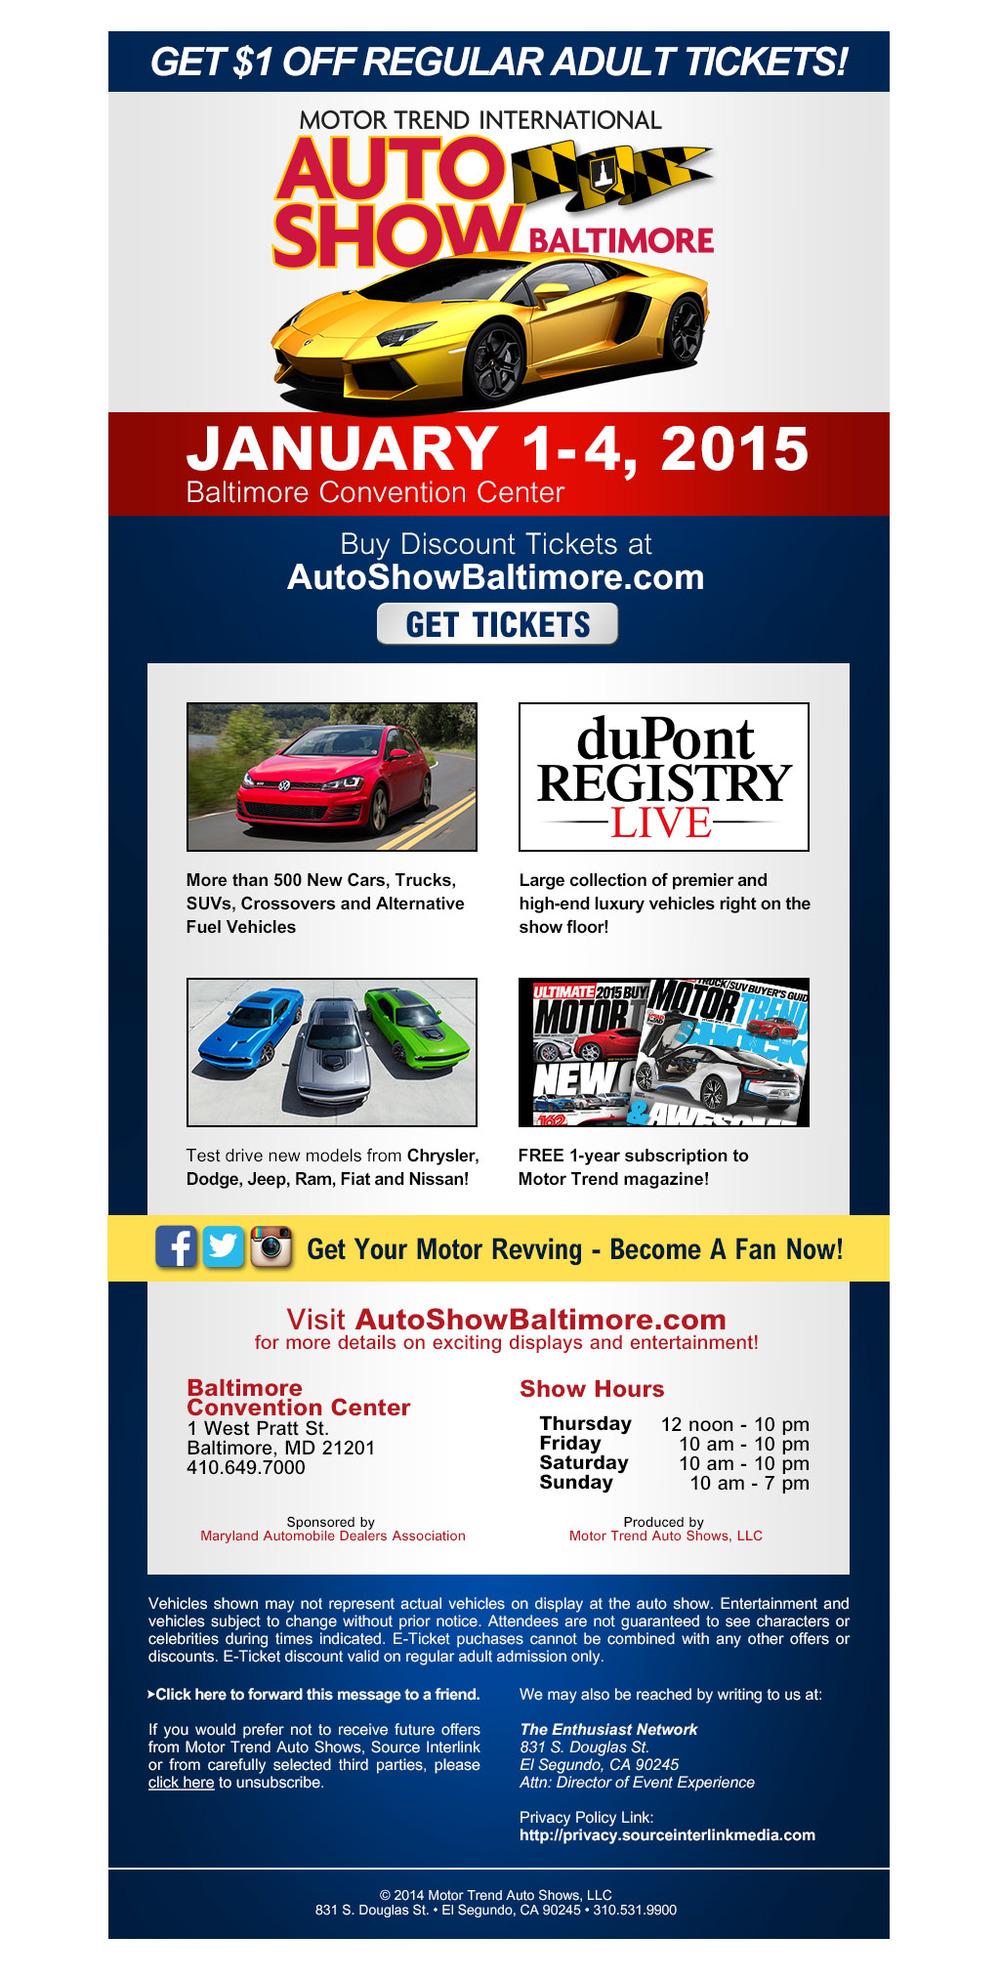 Motor Trend International Auto Show Baltimore Eblast